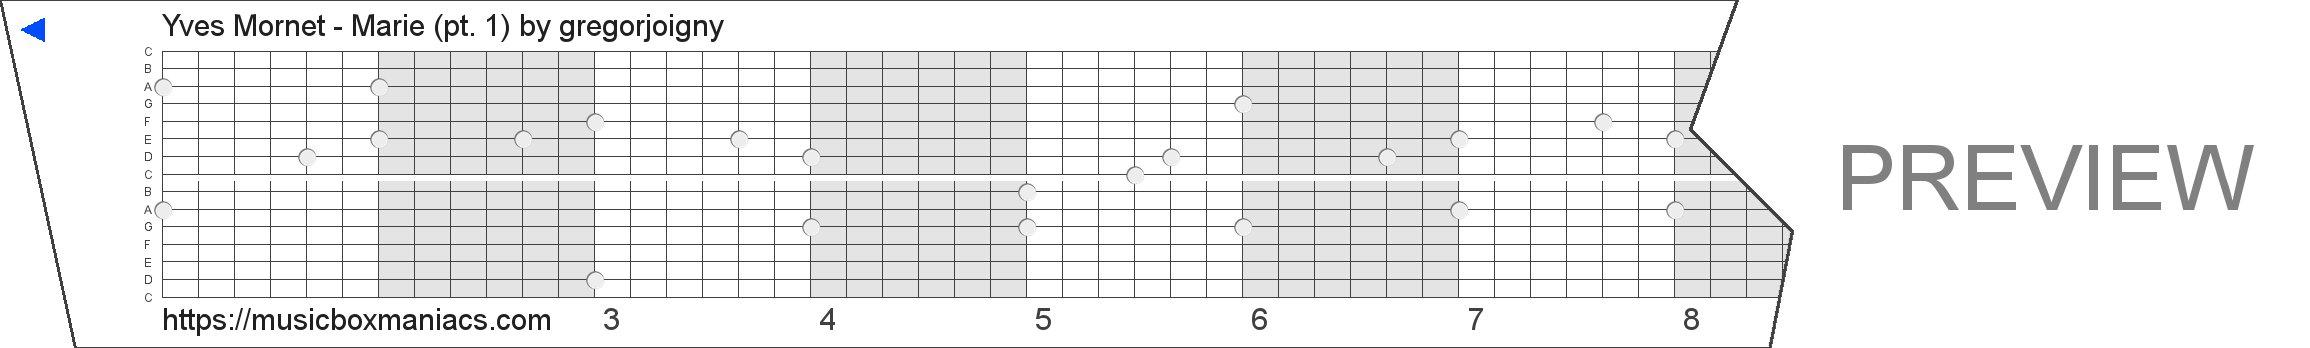 Yves Mornet - Marie (pt. 1) 15 note music box paper strip